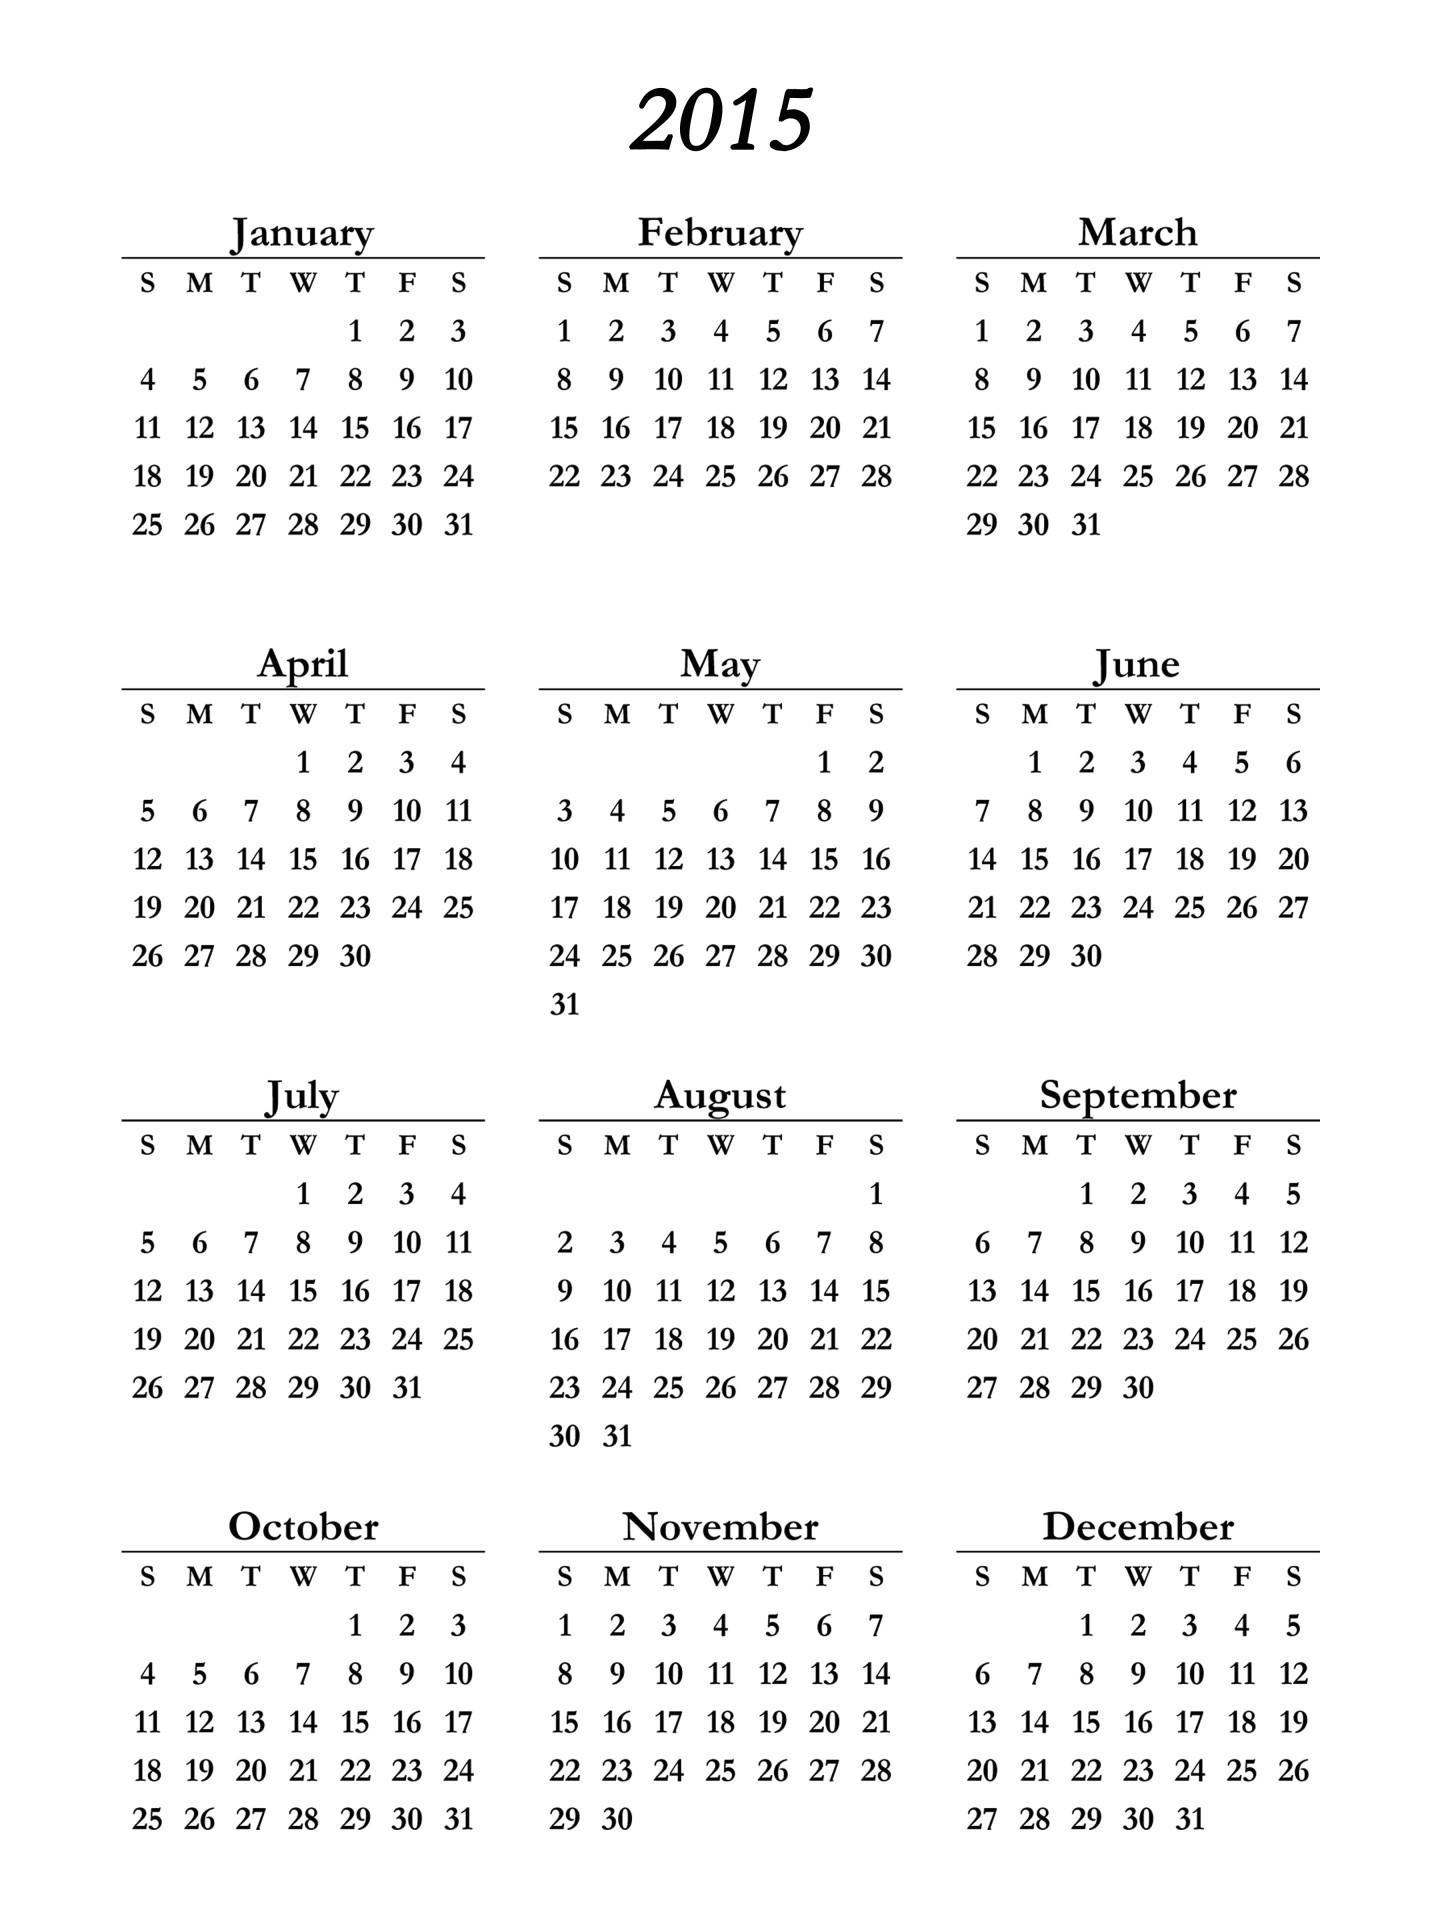 2015 calendar printable 1292